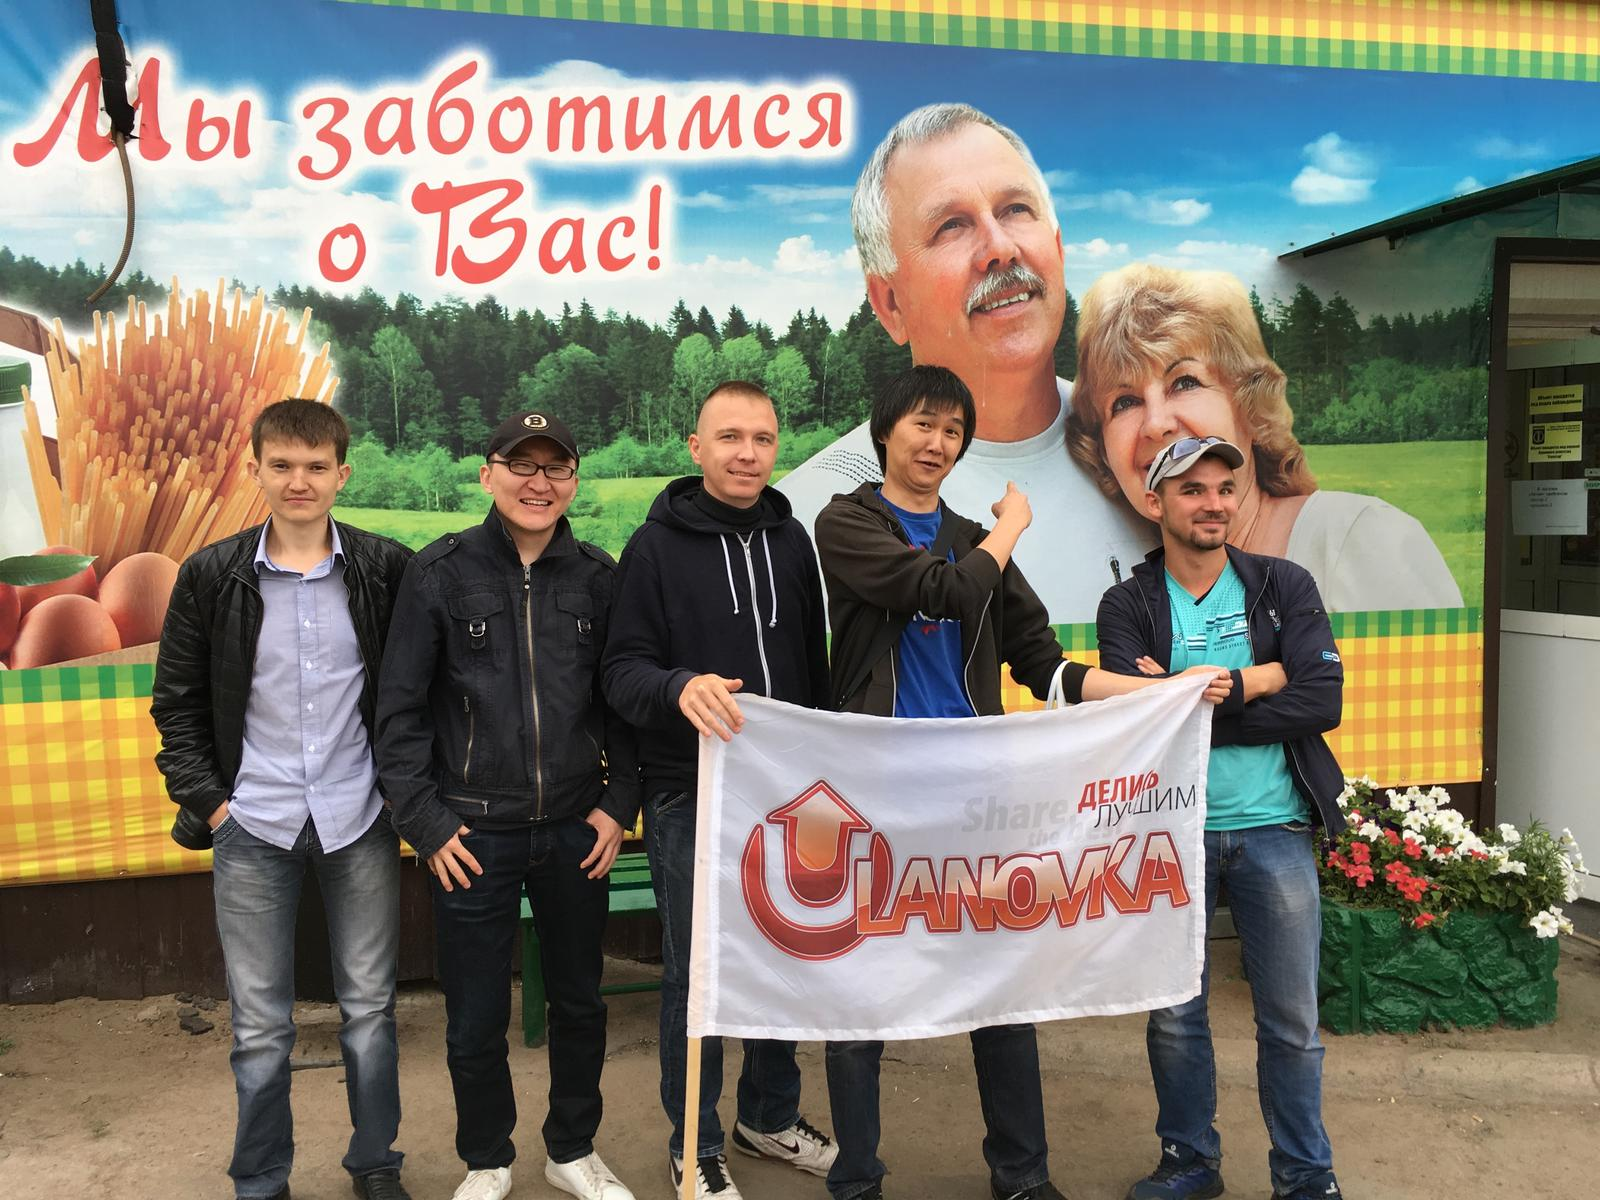 ulanovka_10_years_2017-07-07_18-49-31.jpg